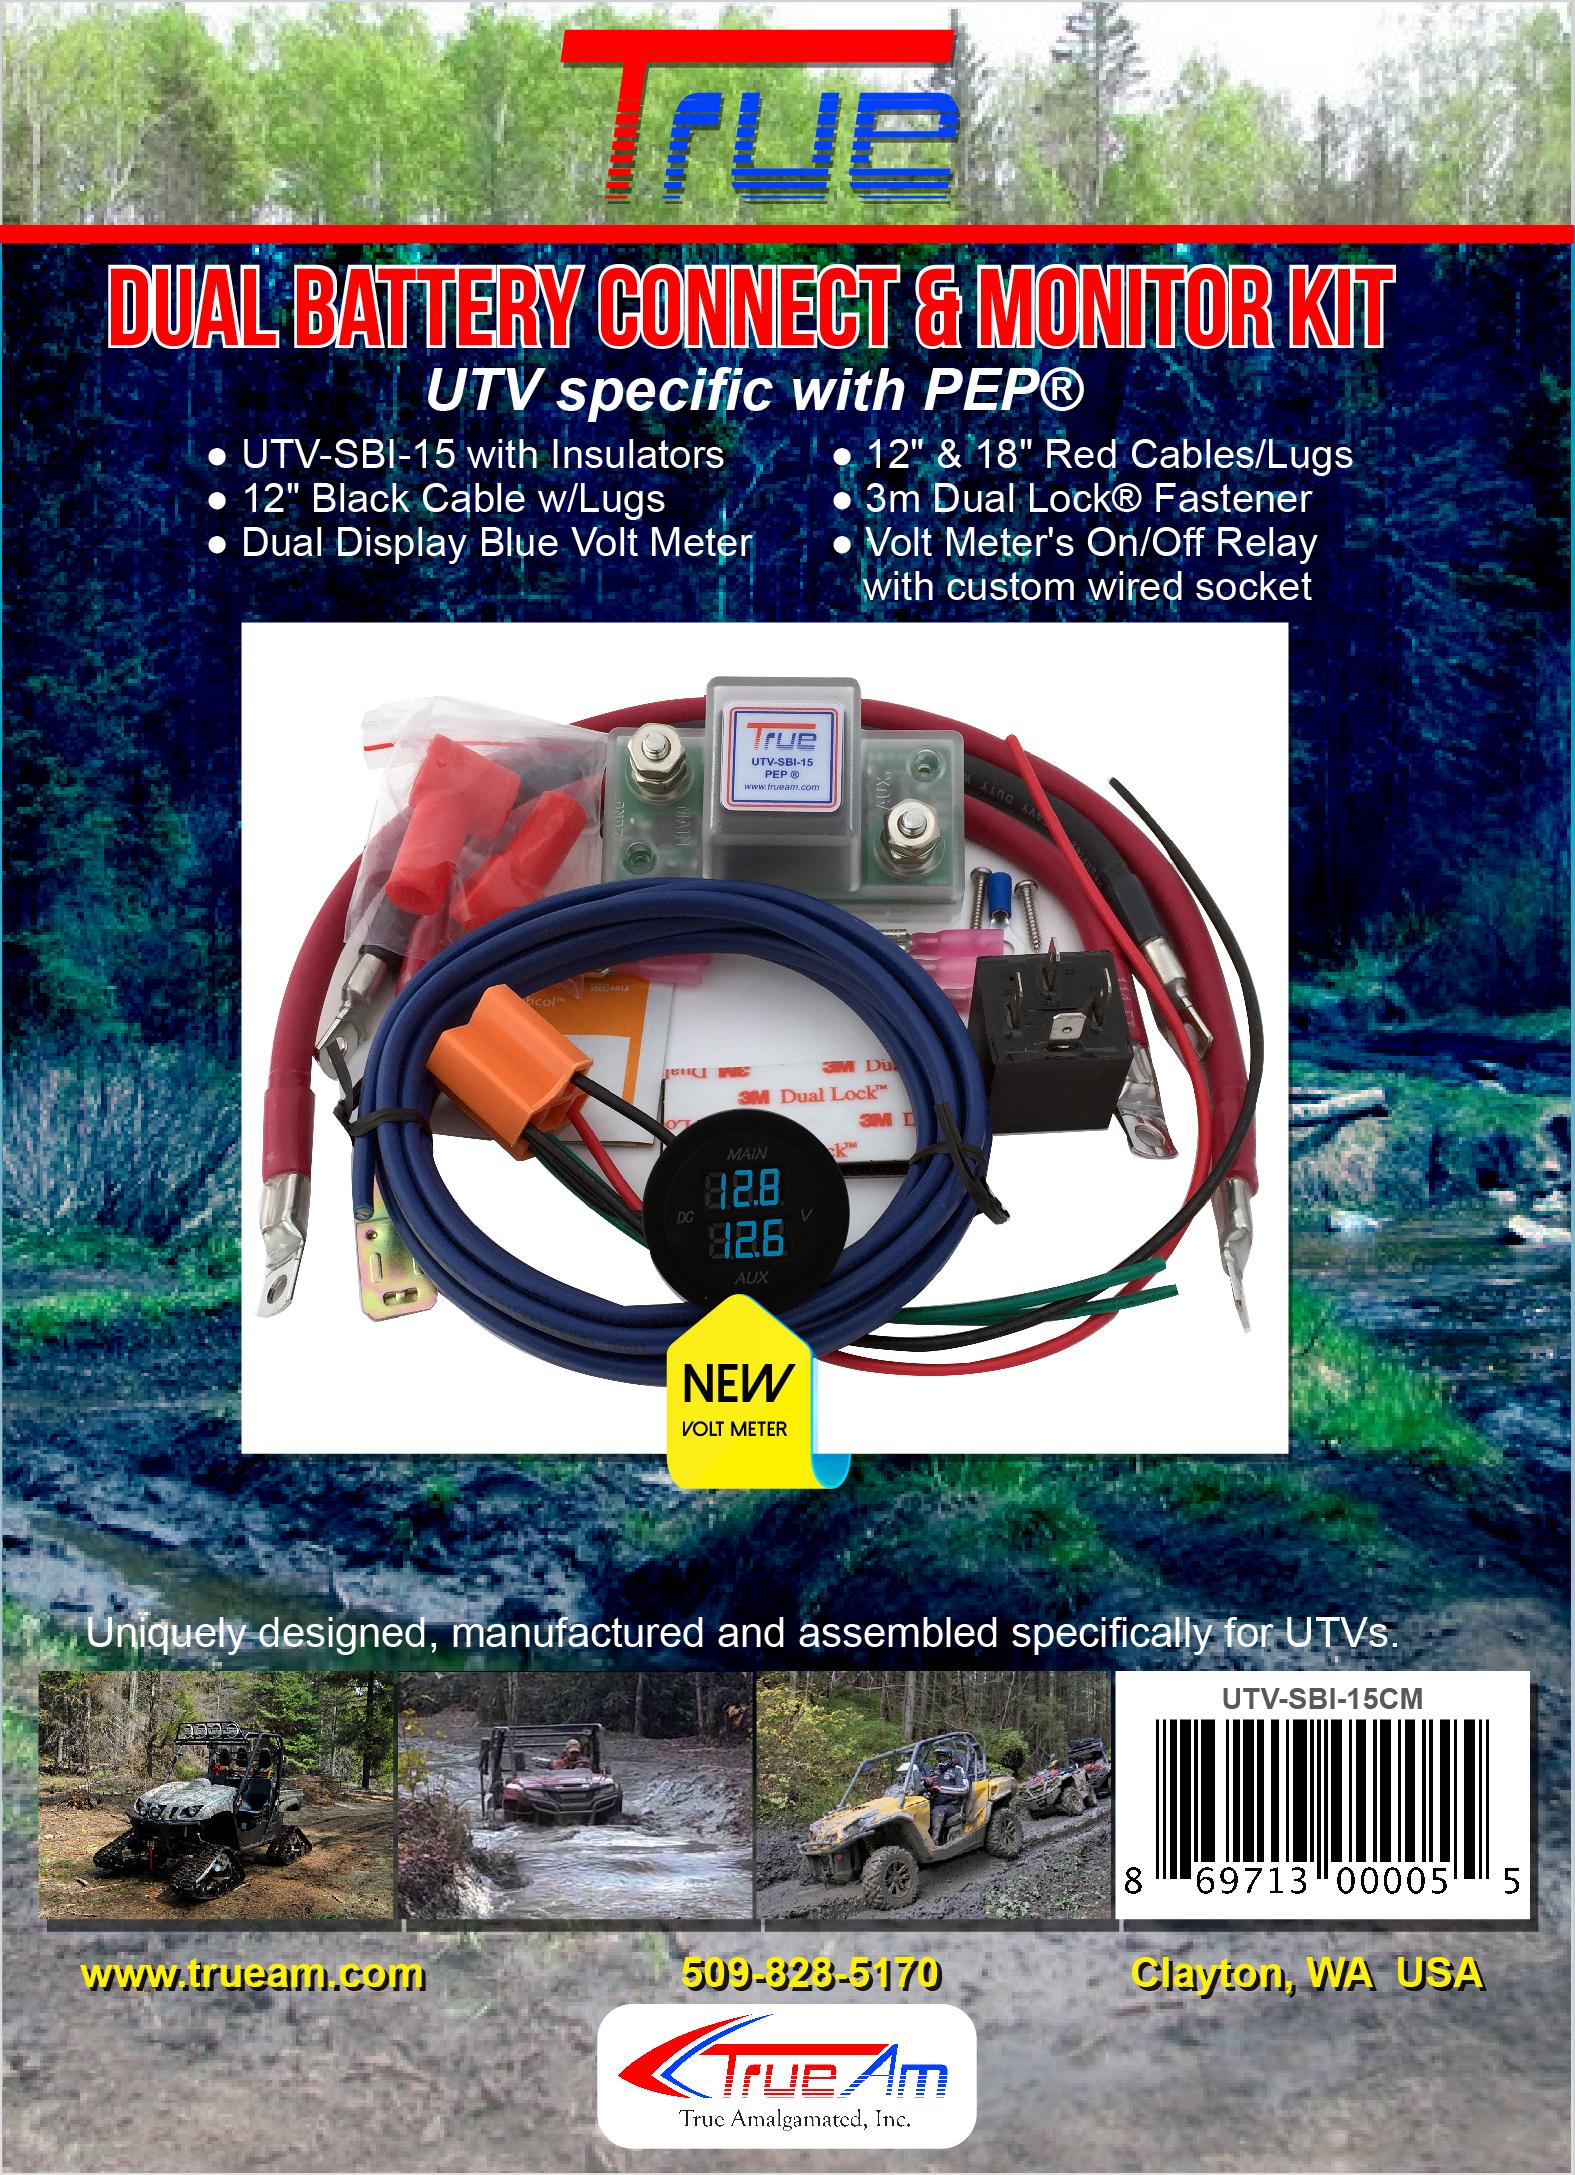 True Utv Sbi Cm Utv Dual Battery Connect Monitor Kit Trueam Dual